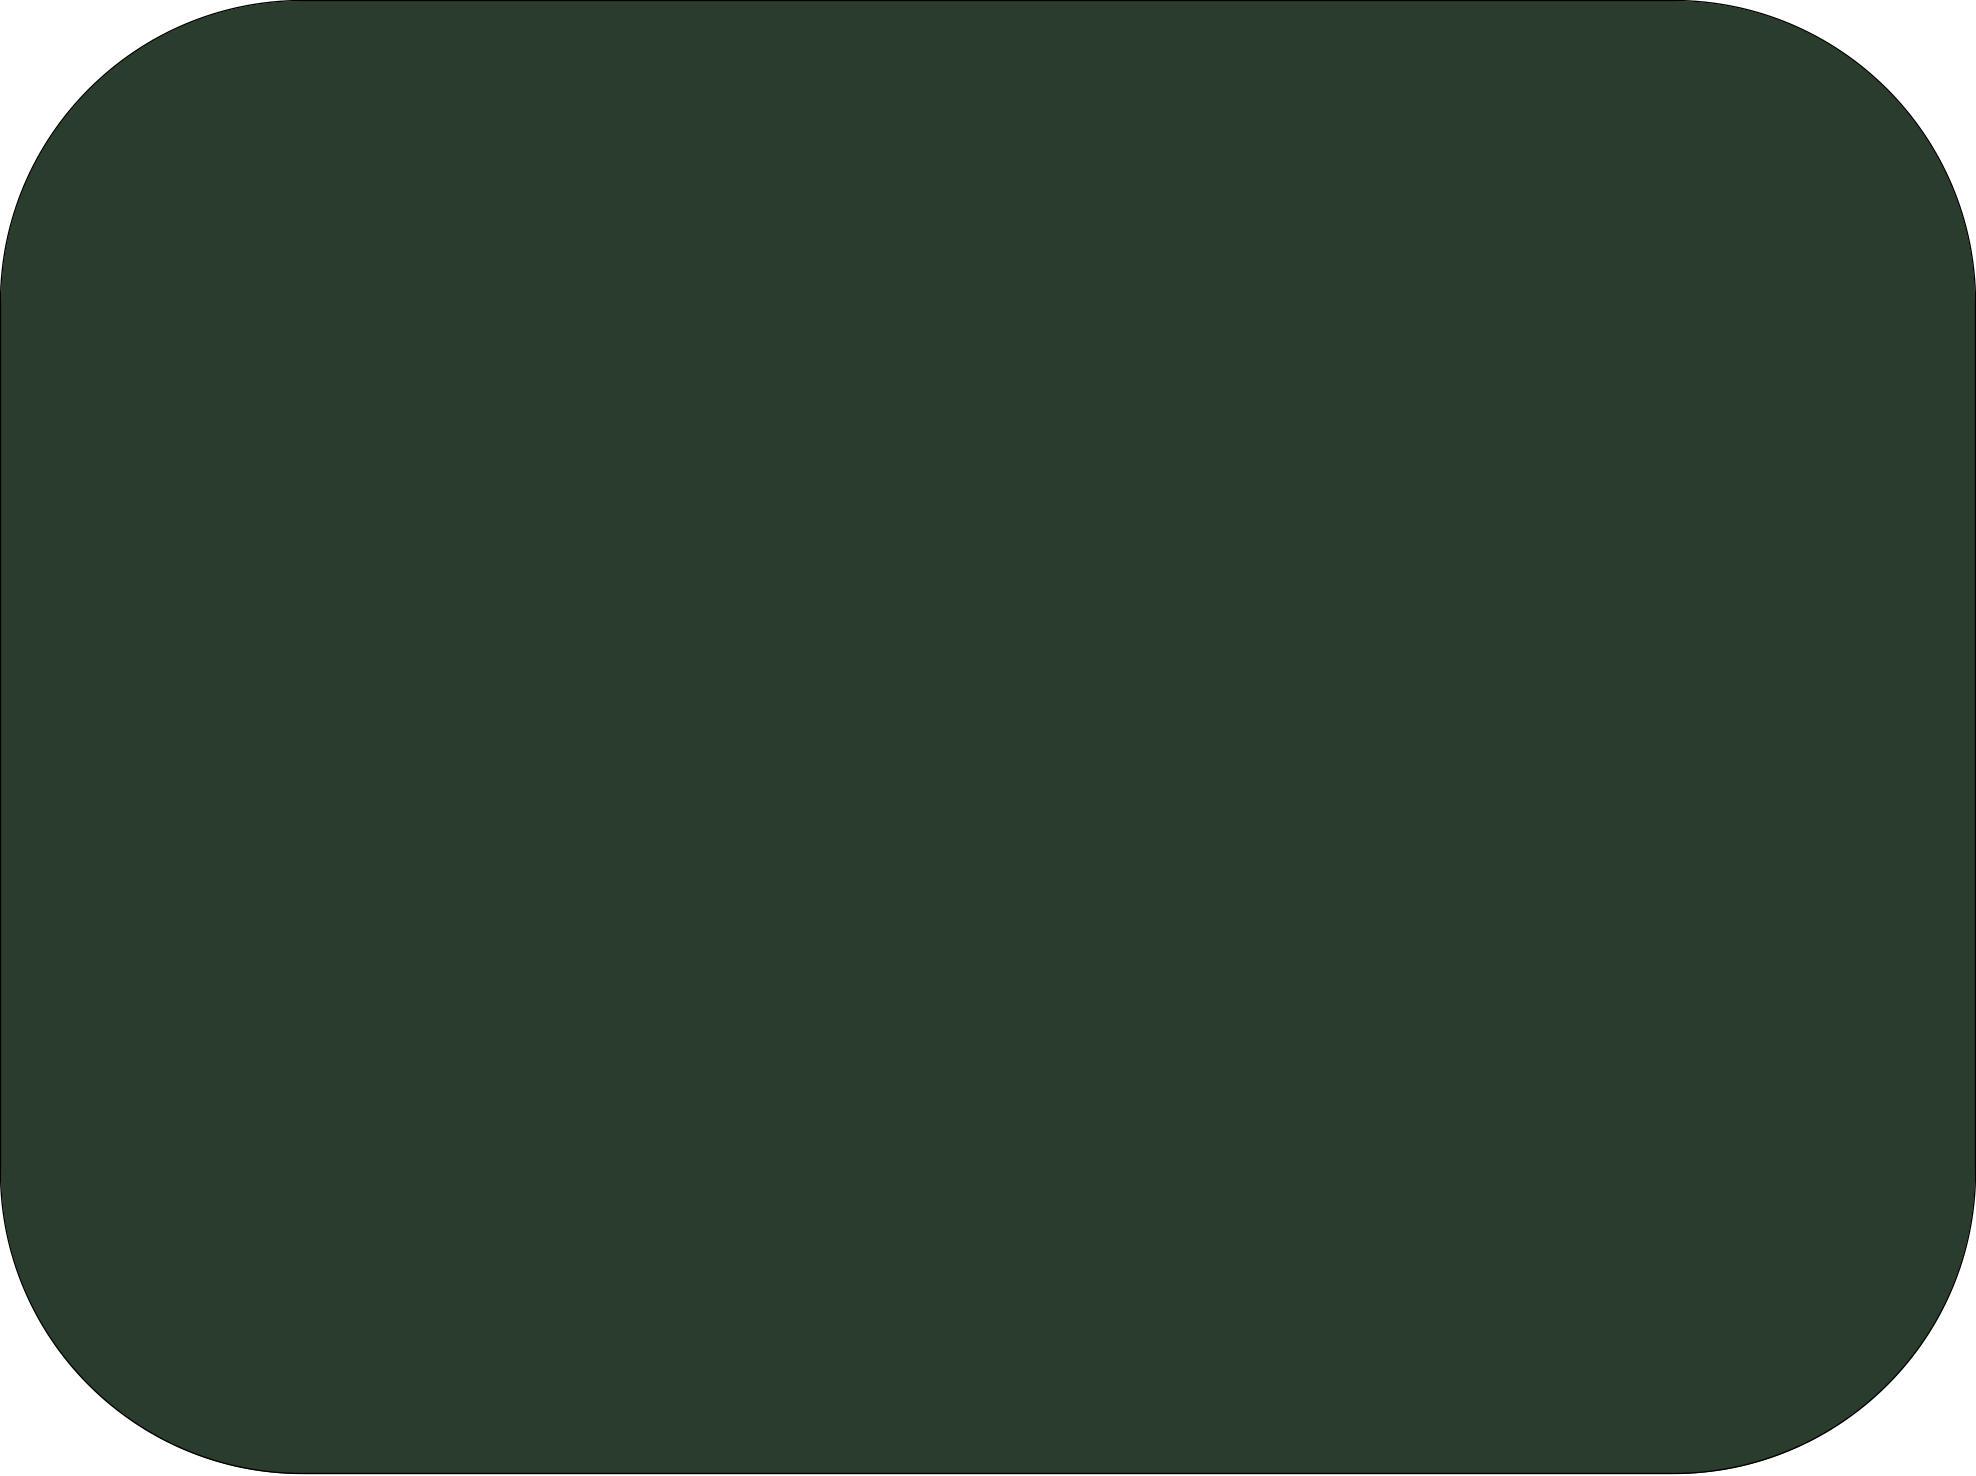 Marshmallow Fondant Flavor Jungle Green Color